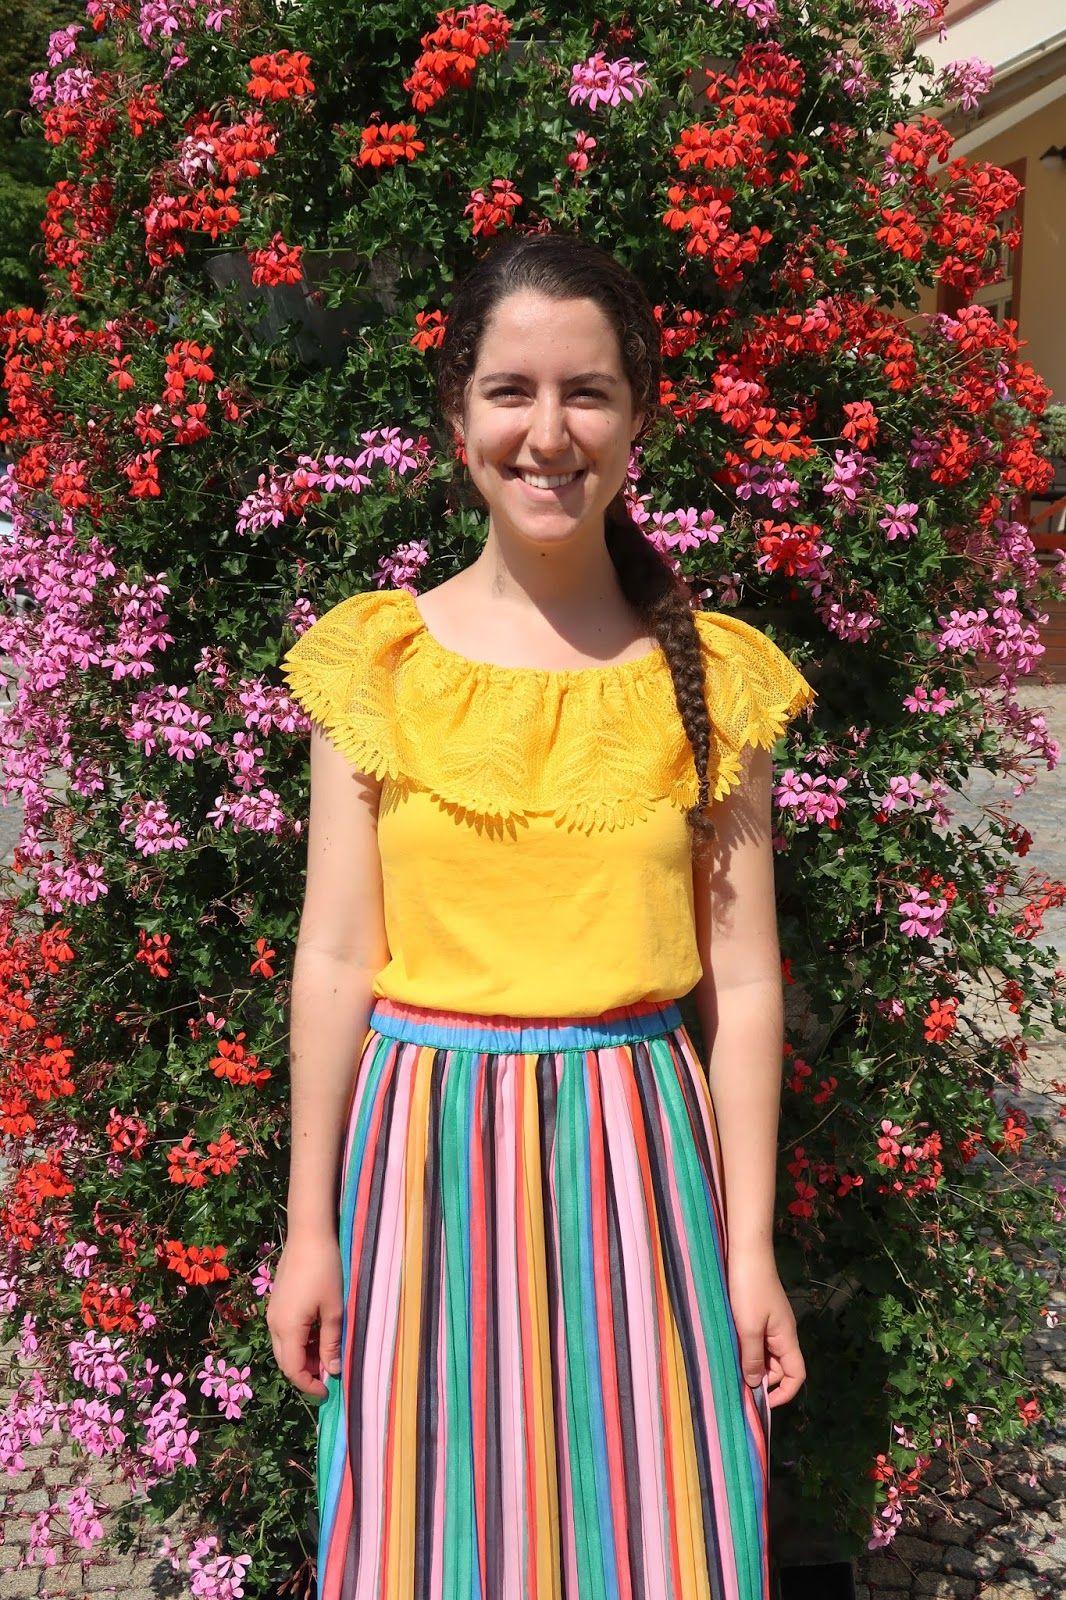 Summer Dresses In Eastern Europe Madison Taylor Summer Dresses Skirt Fashion Dresses [ 1600 x 1066 Pixel ]